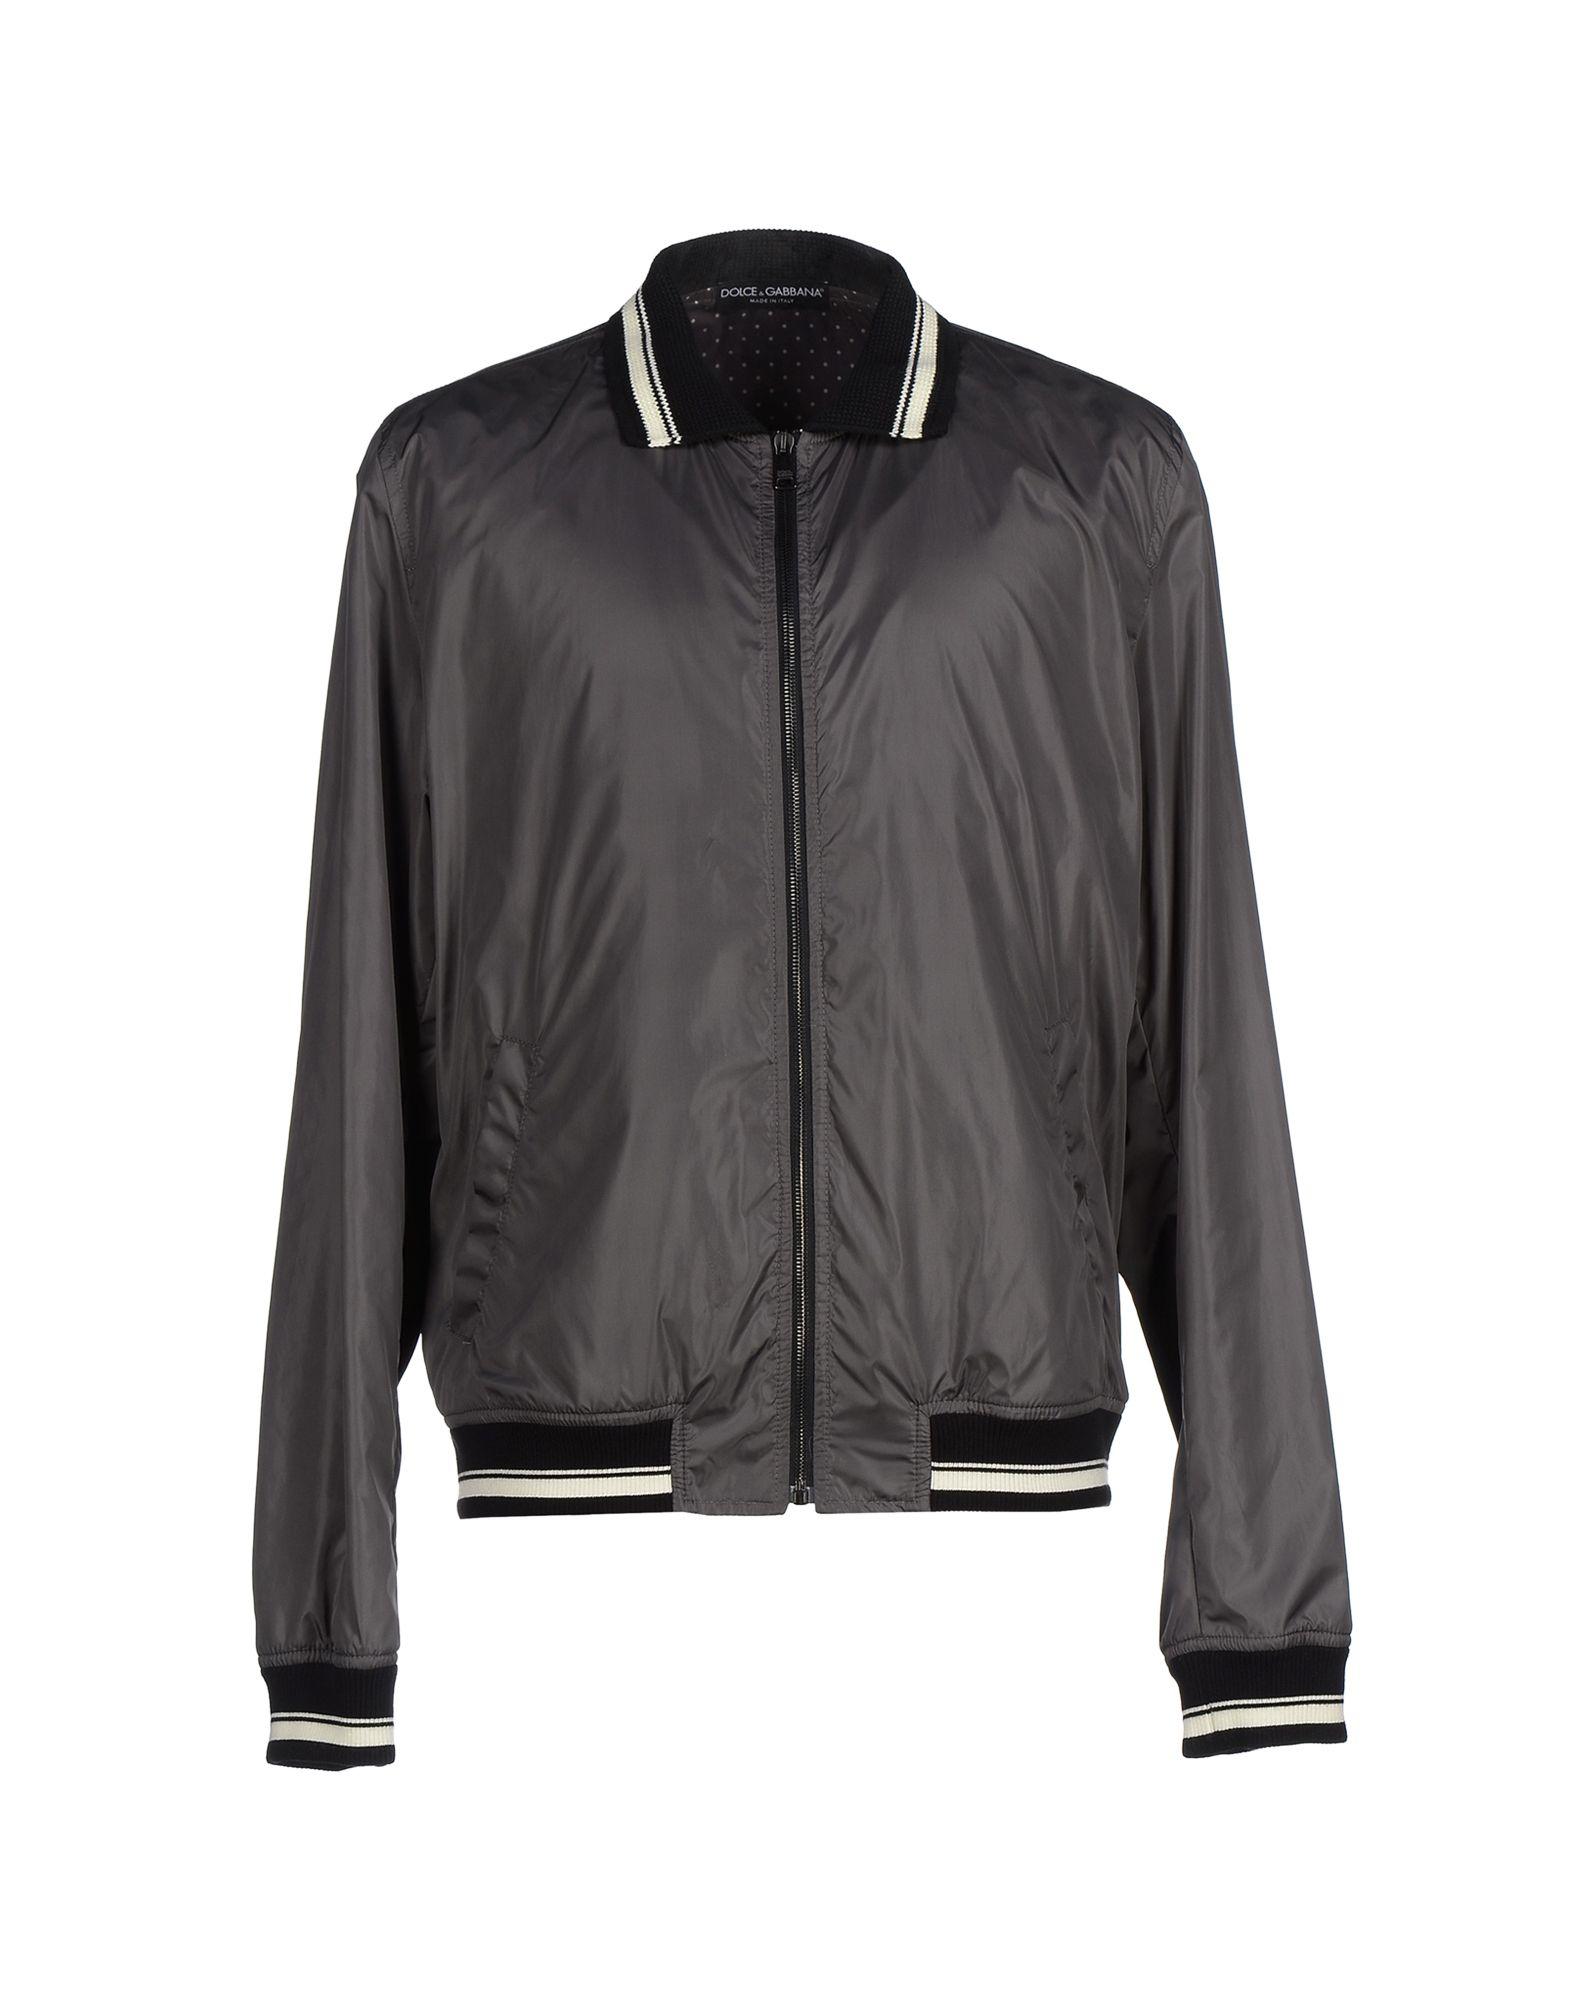 dolce gabbana jacket in gray for men lead lyst. Black Bedroom Furniture Sets. Home Design Ideas